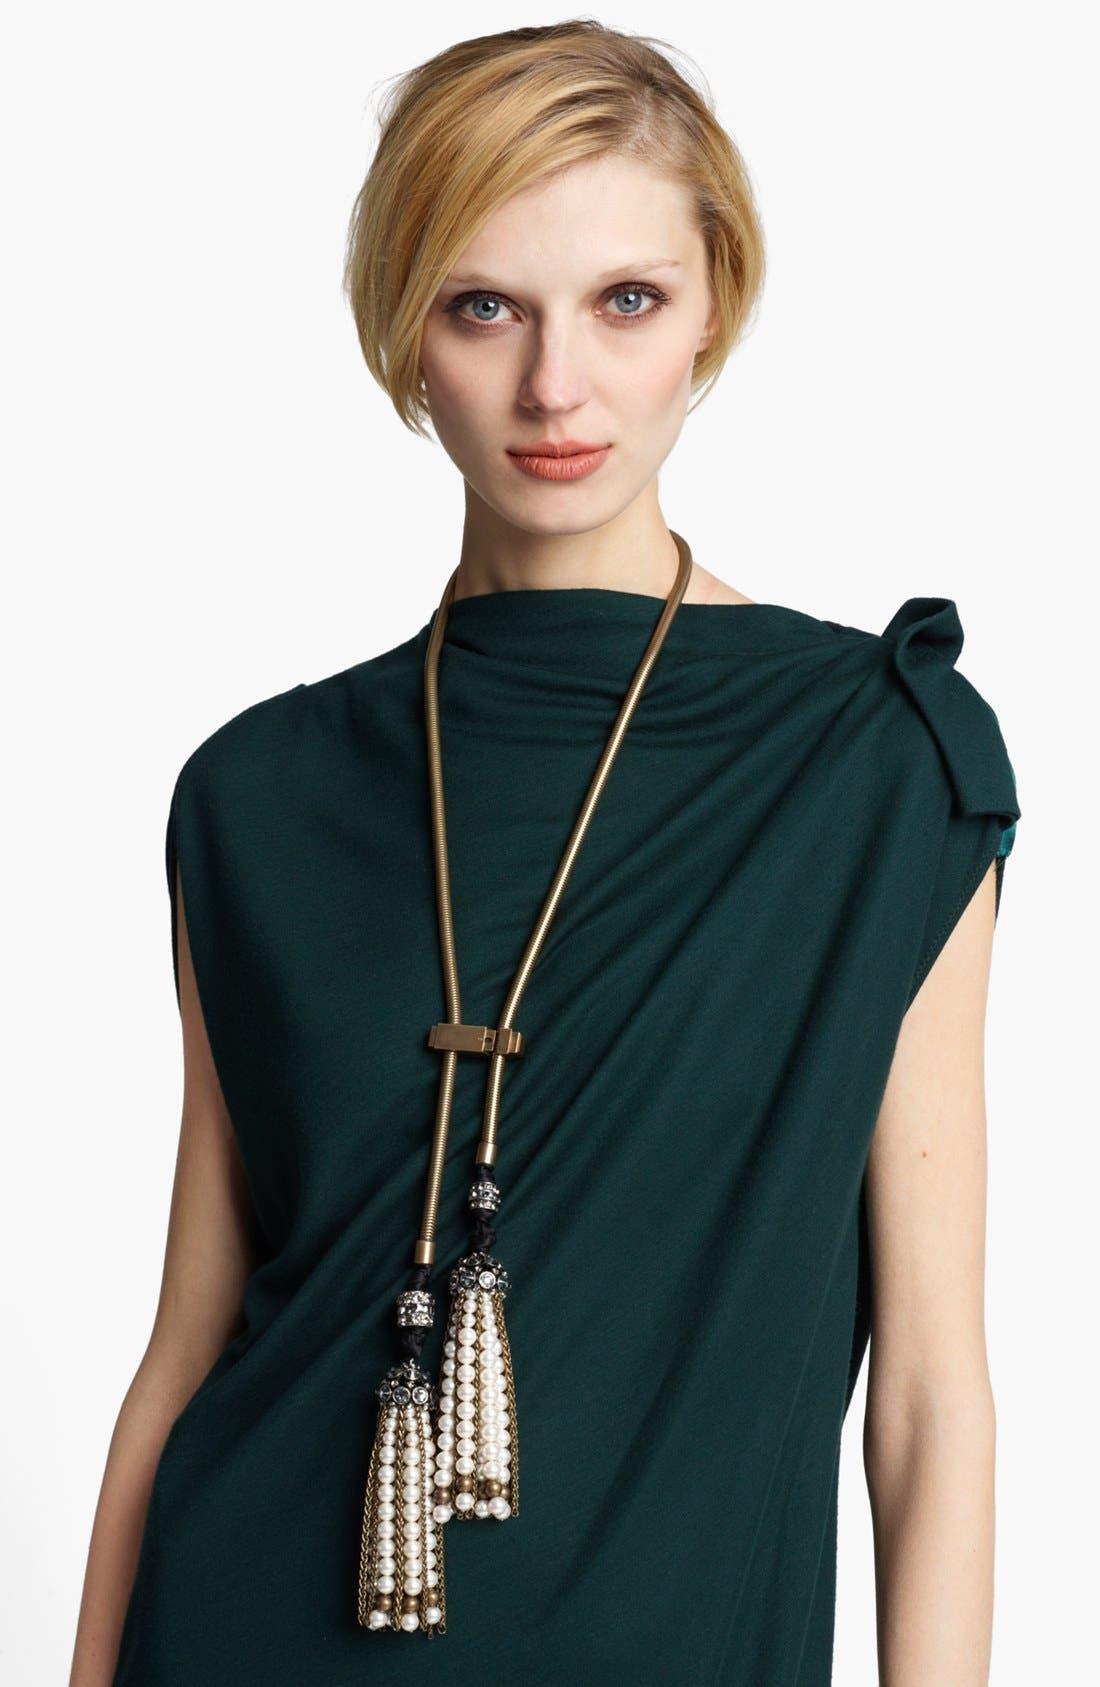 Alternate Image 1 Selected - Lanvin 'Metropolis' Lariat Necklace